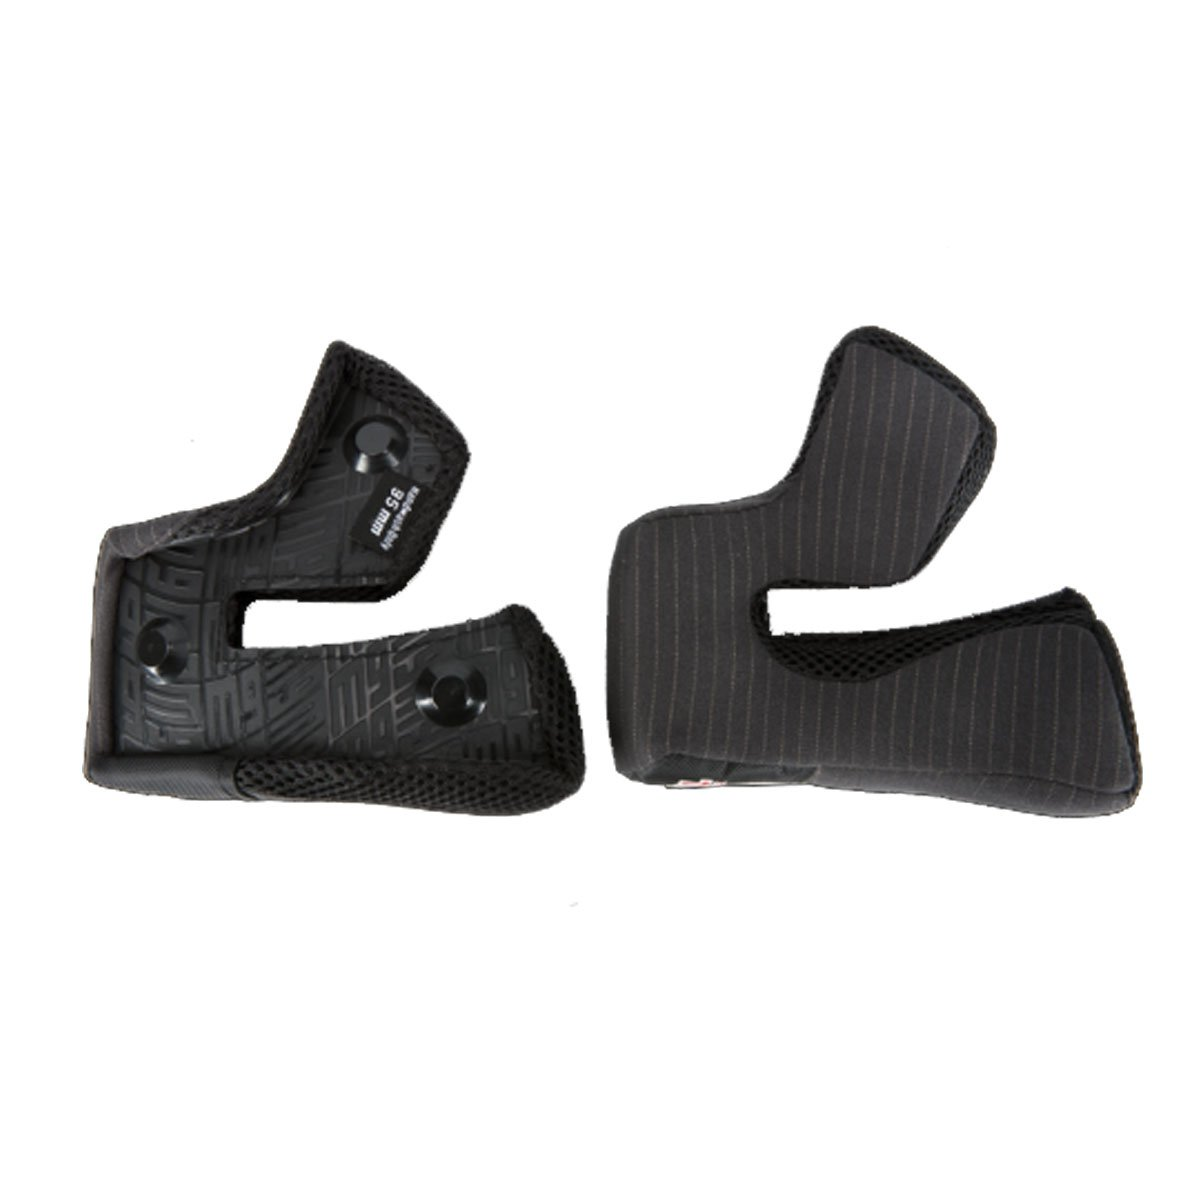 Bell Powersports MOTO-9 Helmet Cheek Pad Set - One Size Fits All - 30mm - 8013425 (Black)